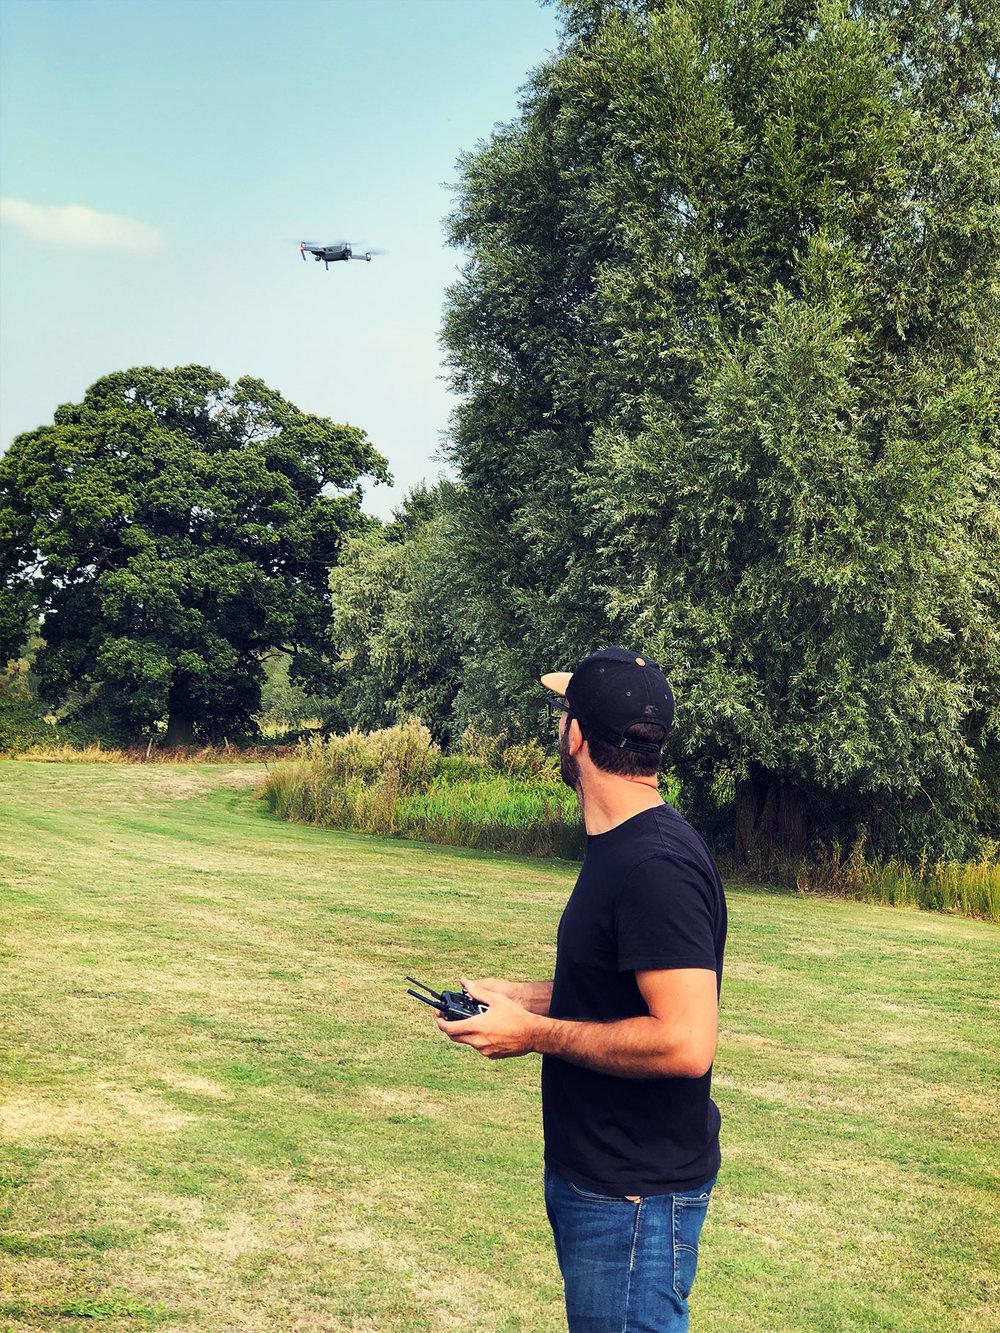 Drone Image 19.jpg